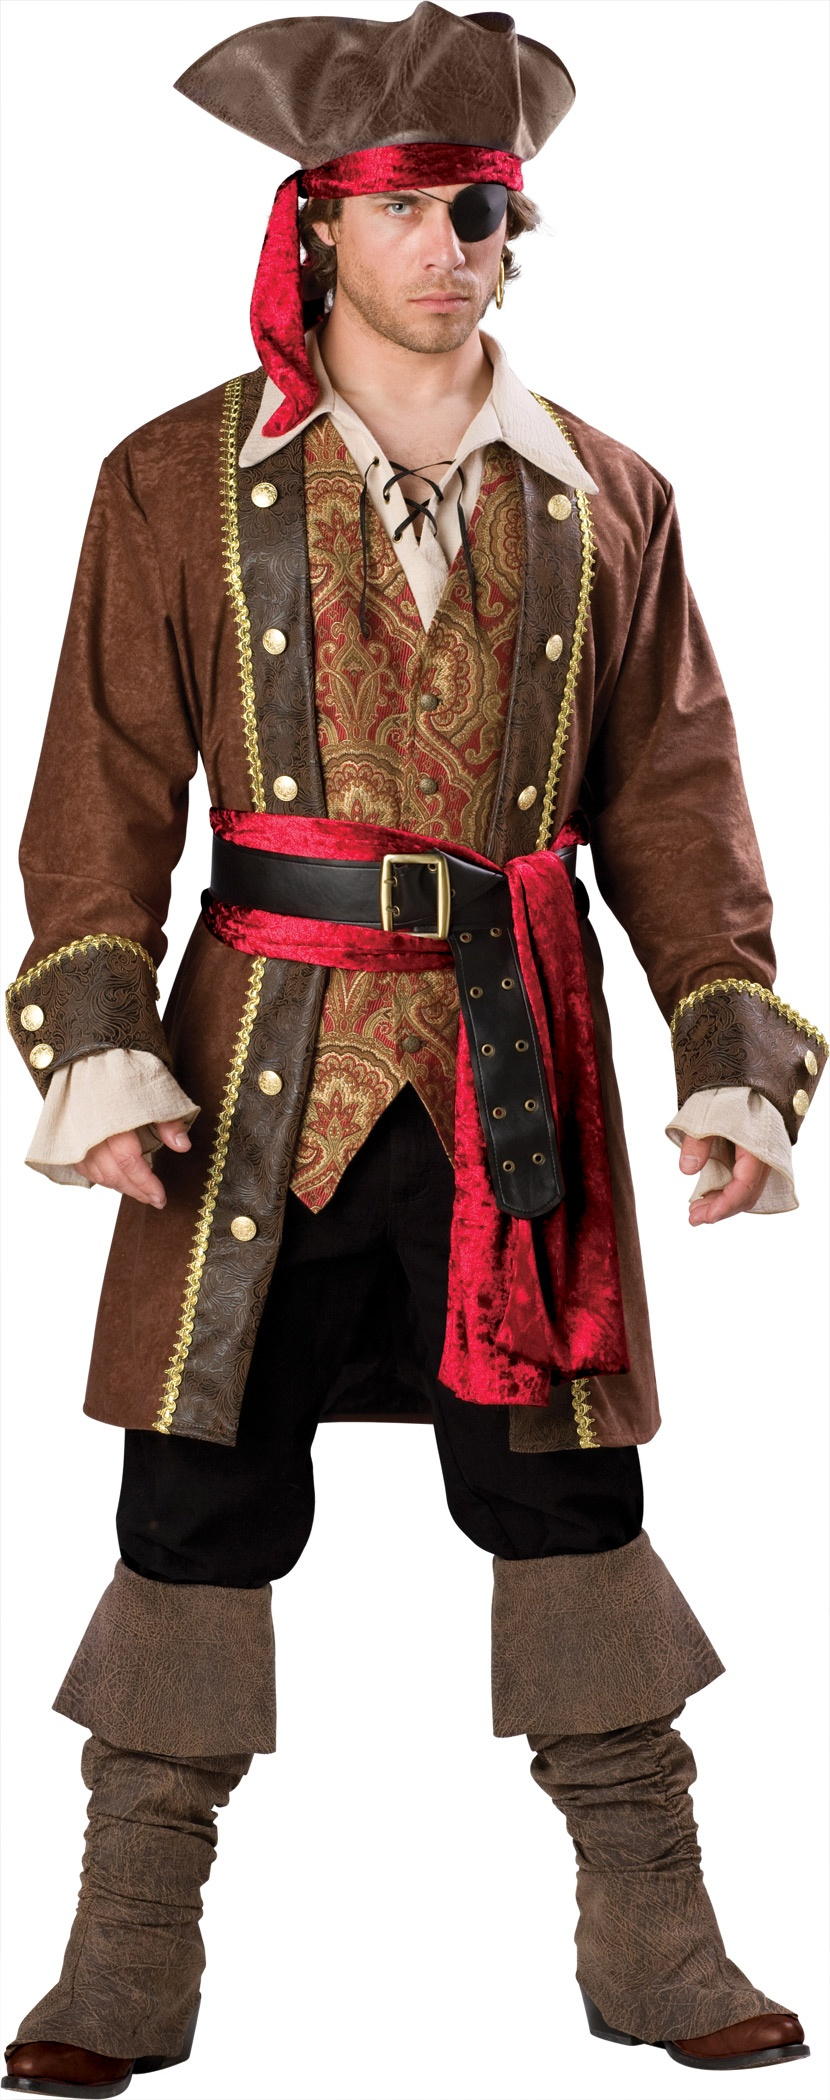 Captain Skullduggery Pirate Costume